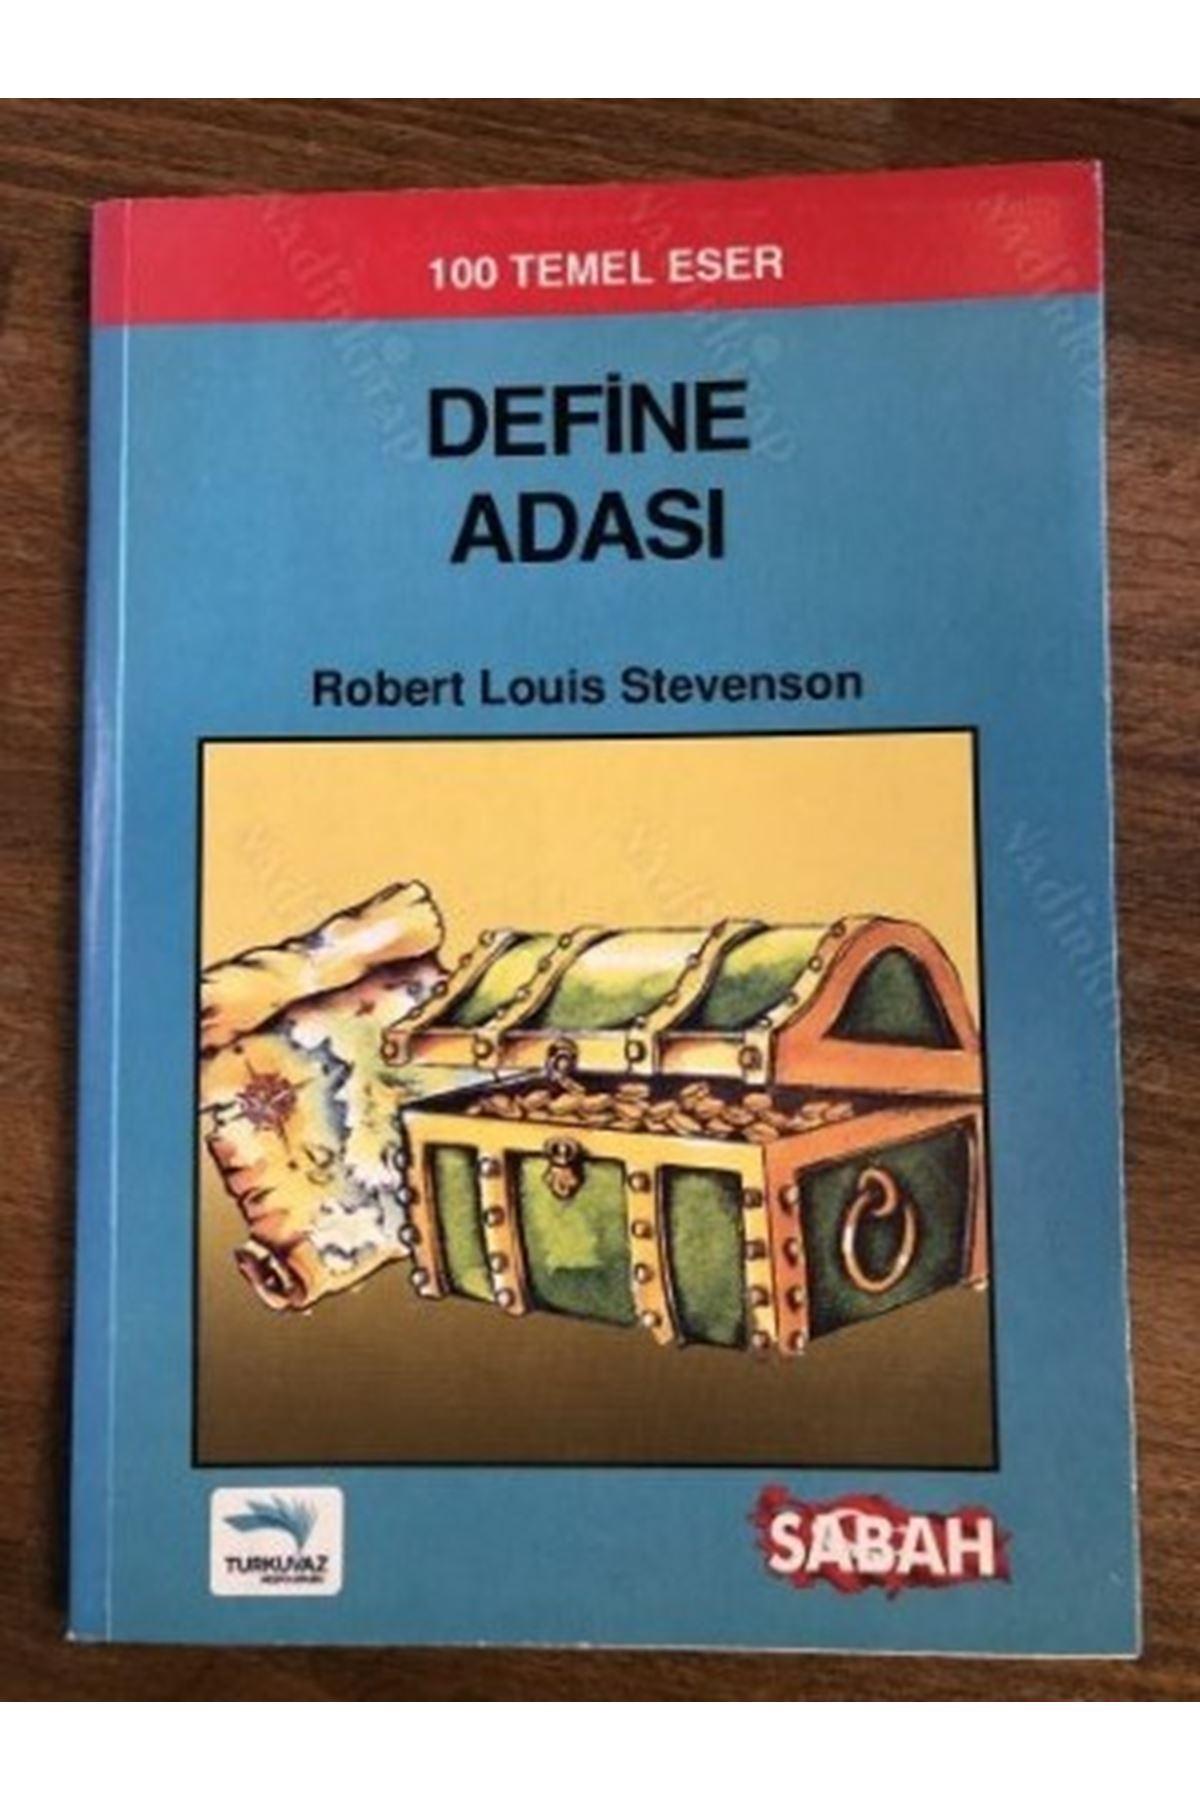 ROBERT LOUİS STEVENSON - DEFİNE ADASI